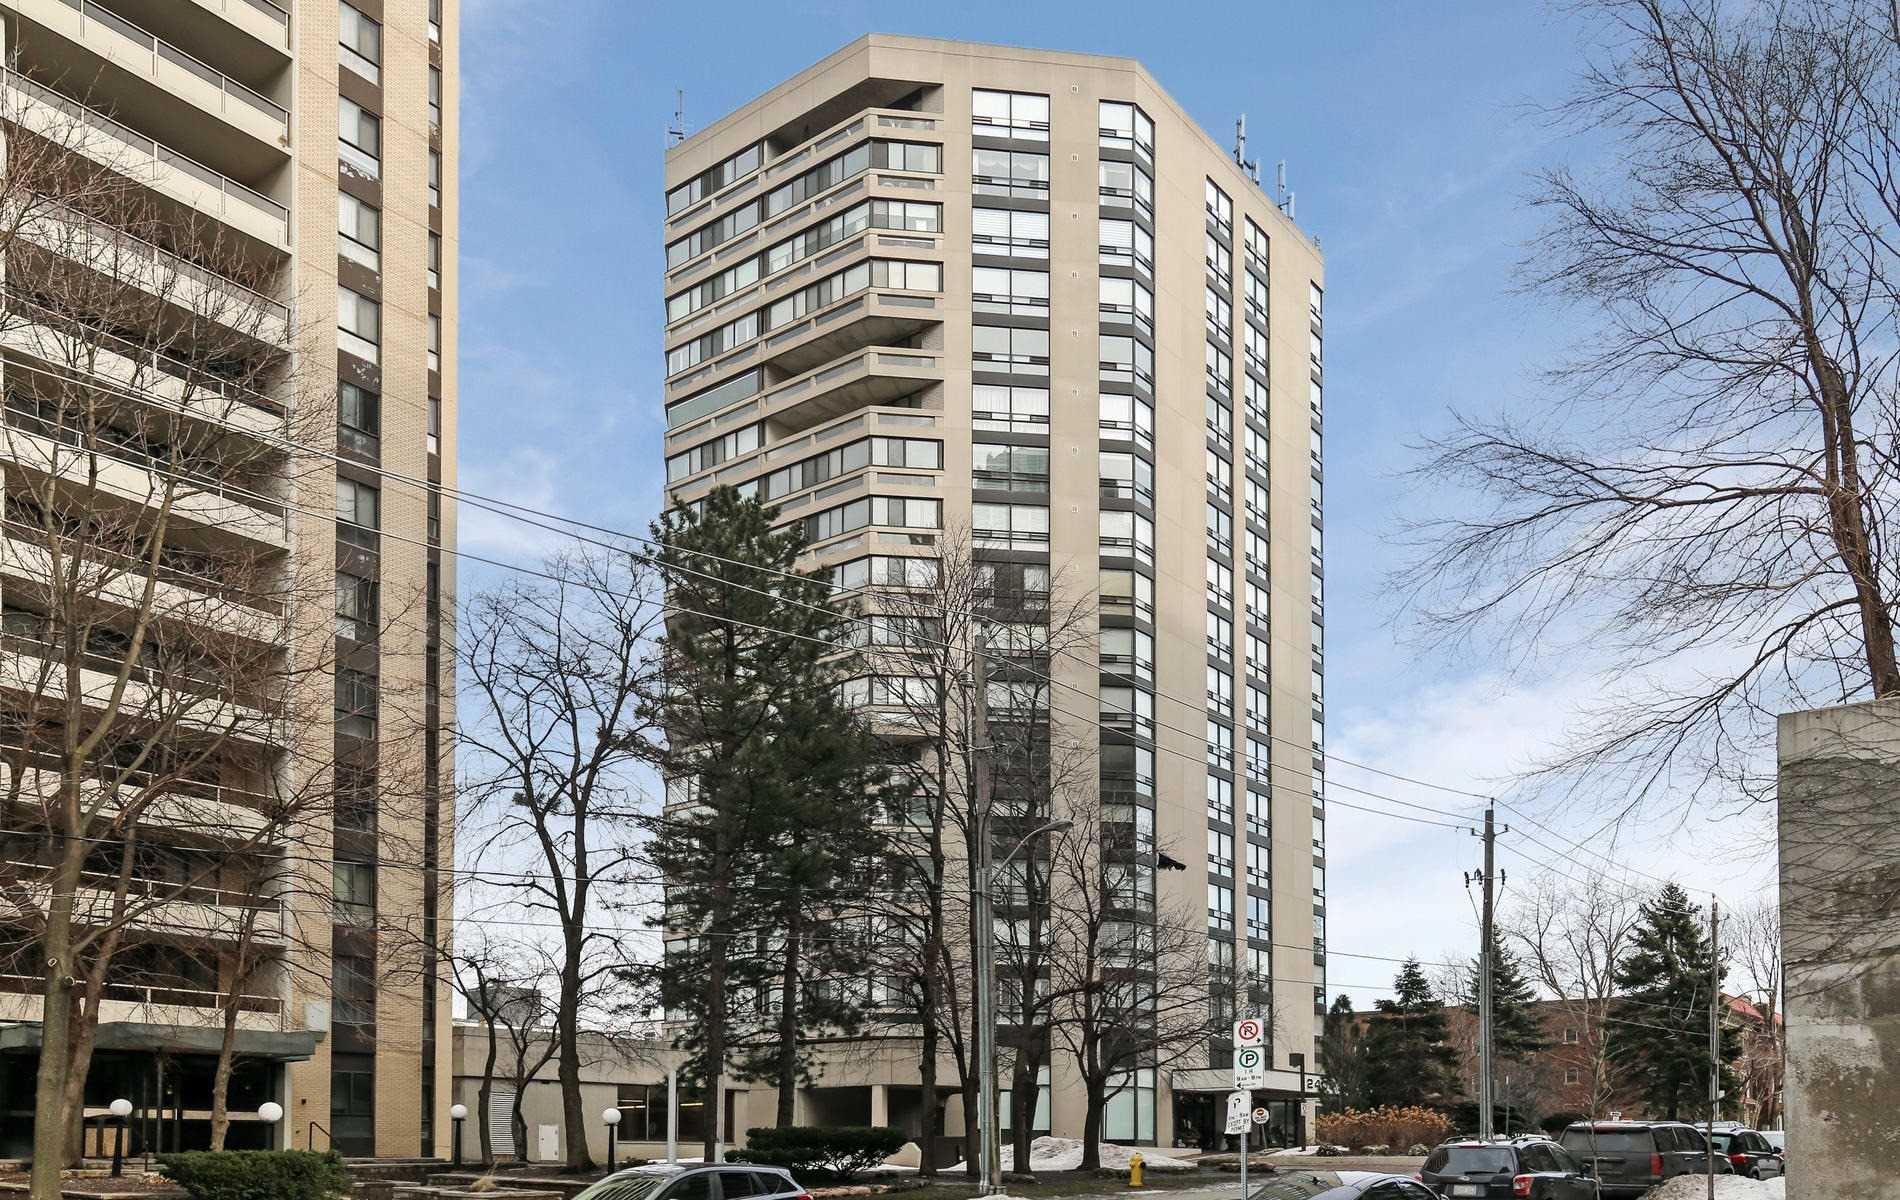 240 Heath St W, Toronto, MLS® # C4351582